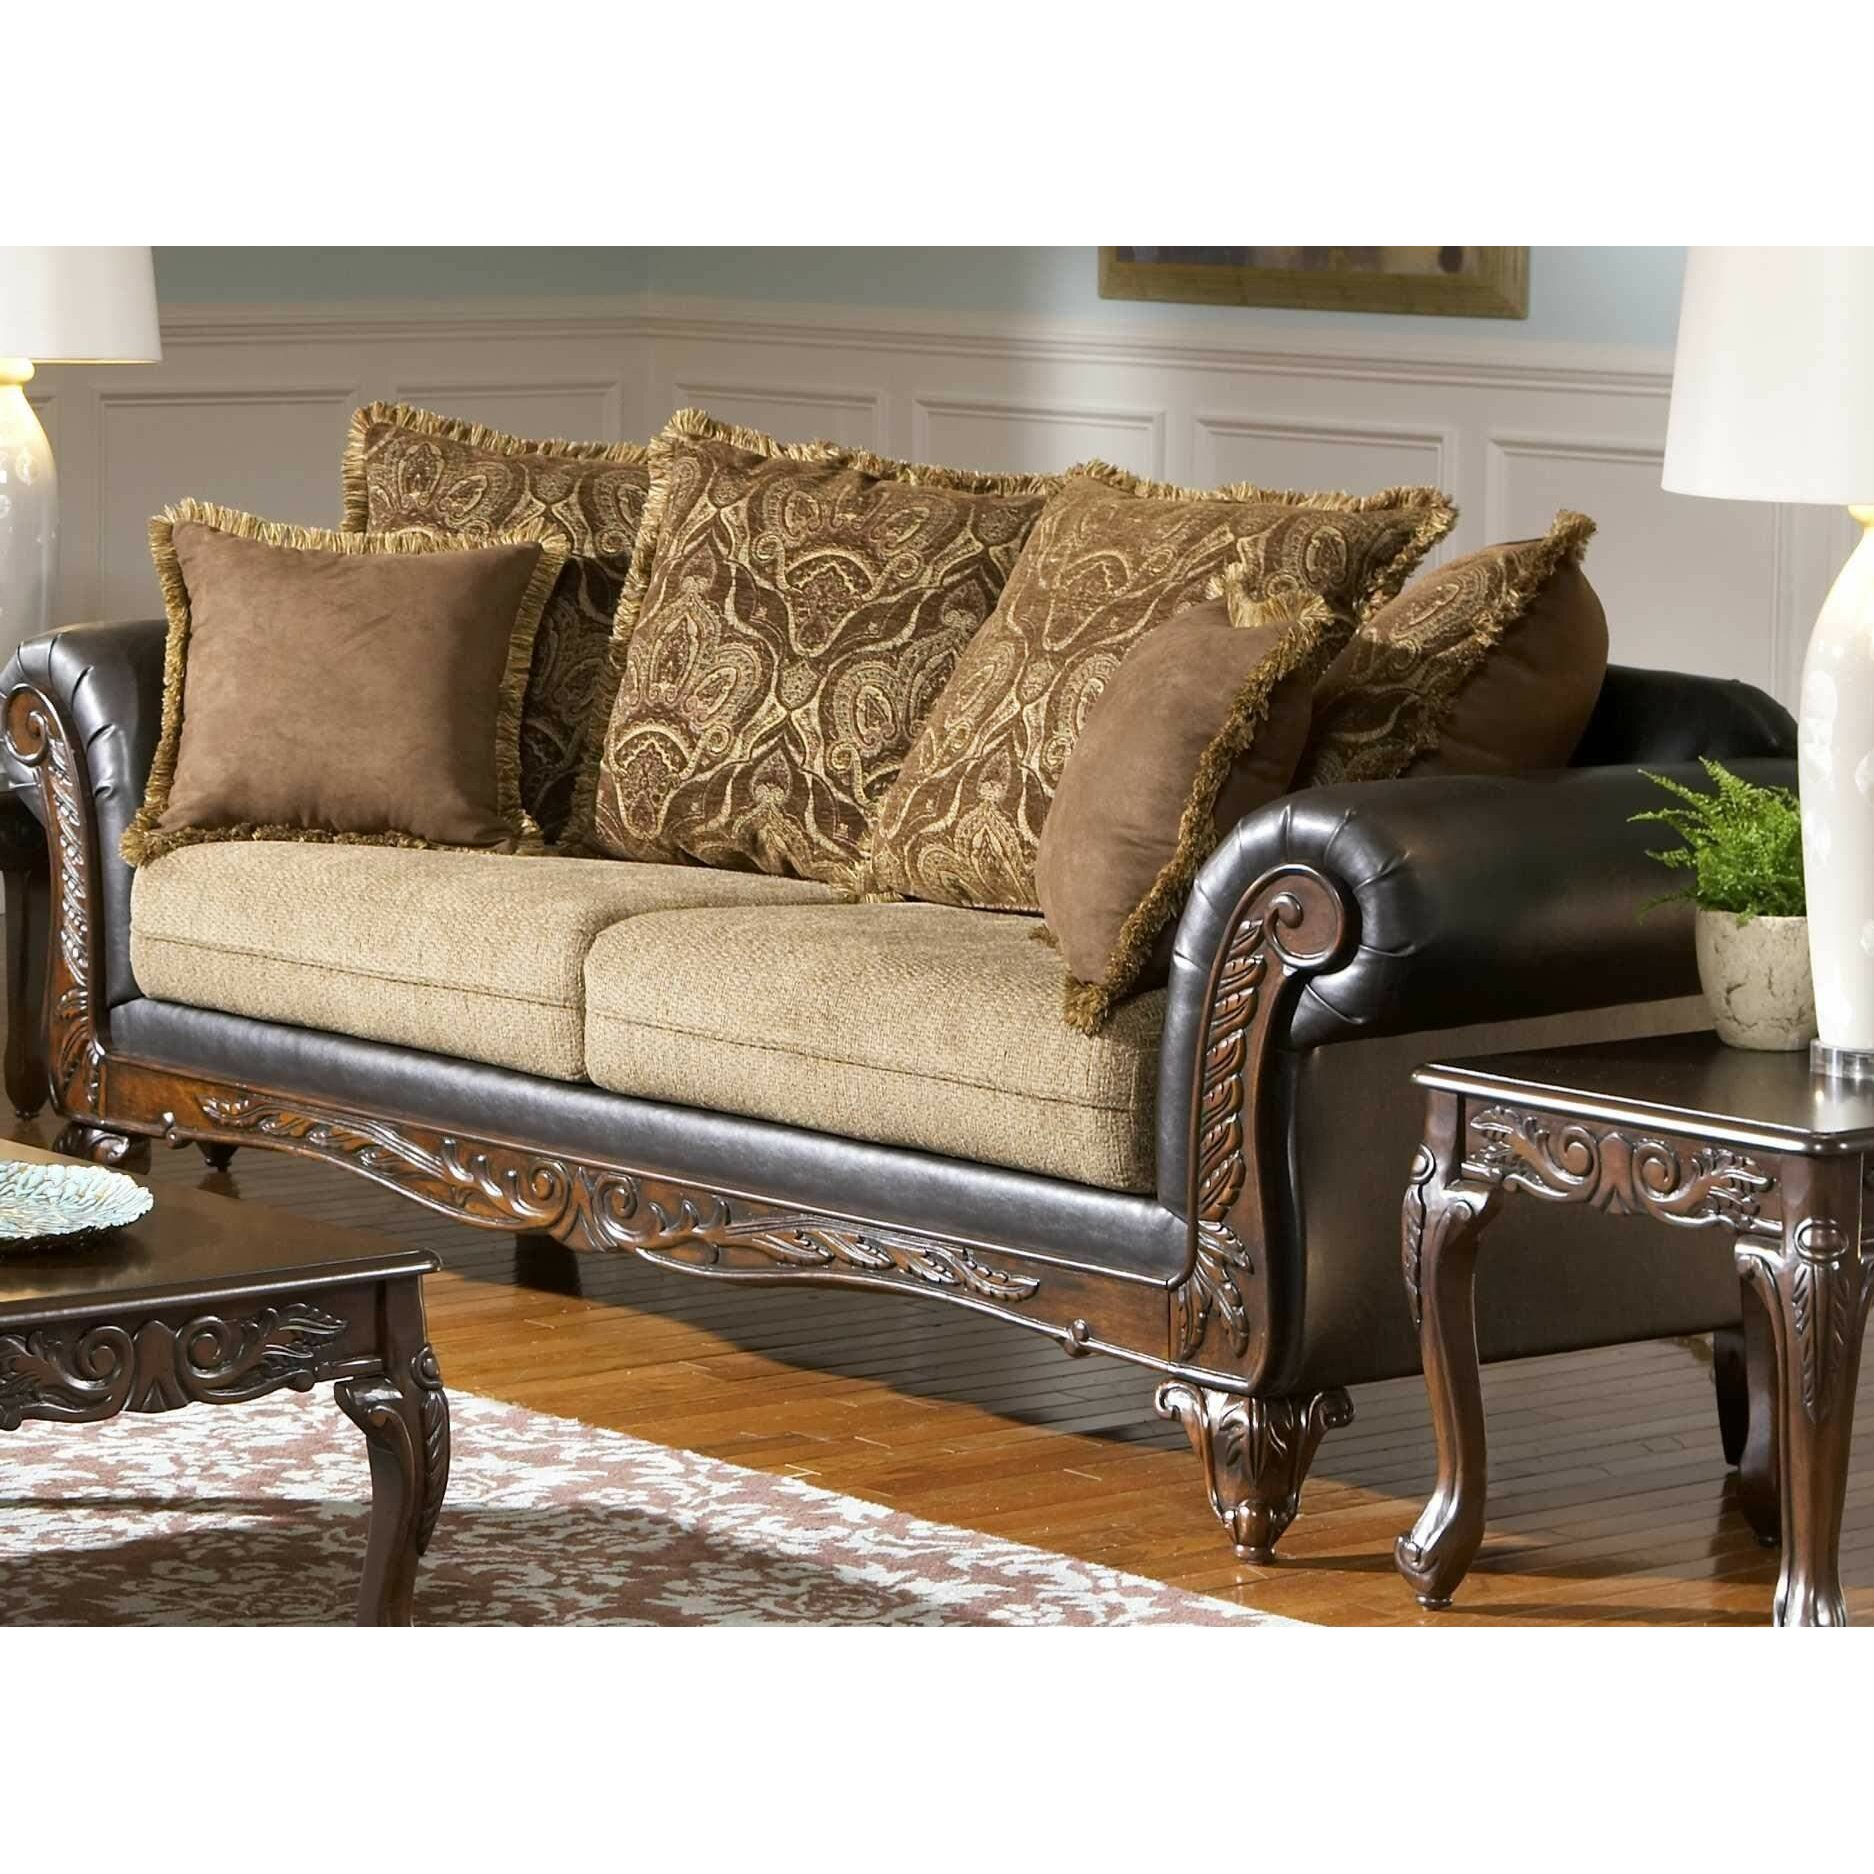 Serta Living Room Furniture Alcott Hill Serta Upholstery Darcy Sofa Reviews Wayfair